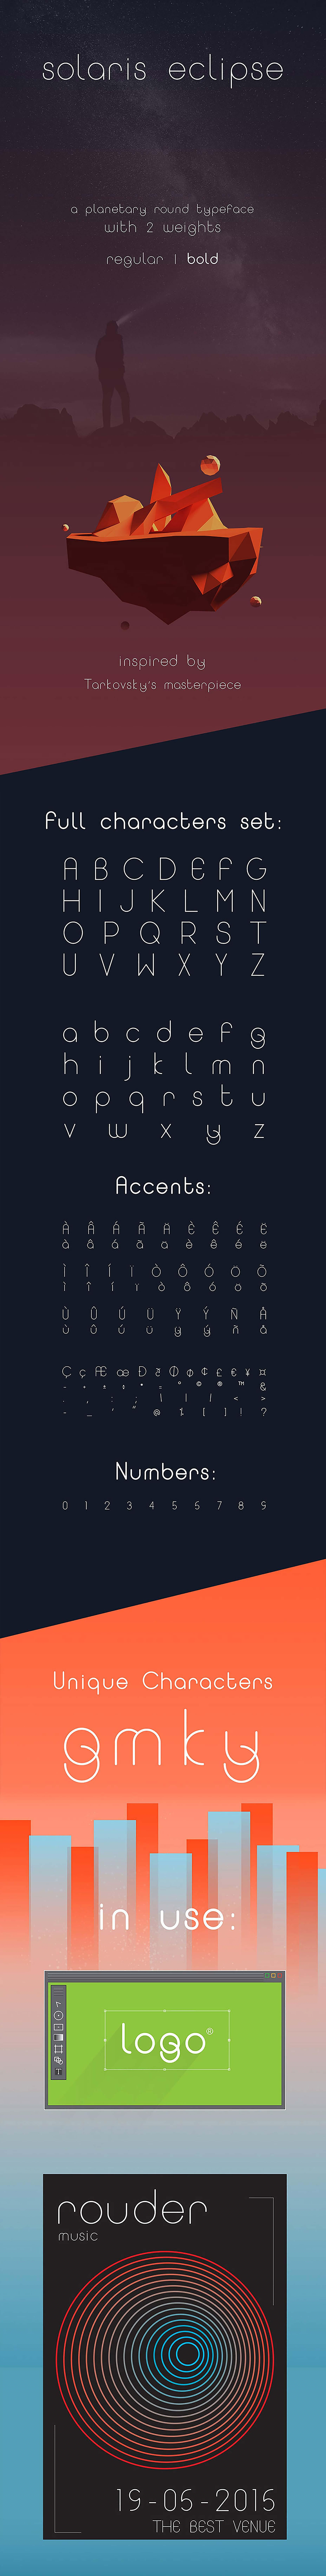 Free download: Solaris Eclipse font family | C27 logo inspiration